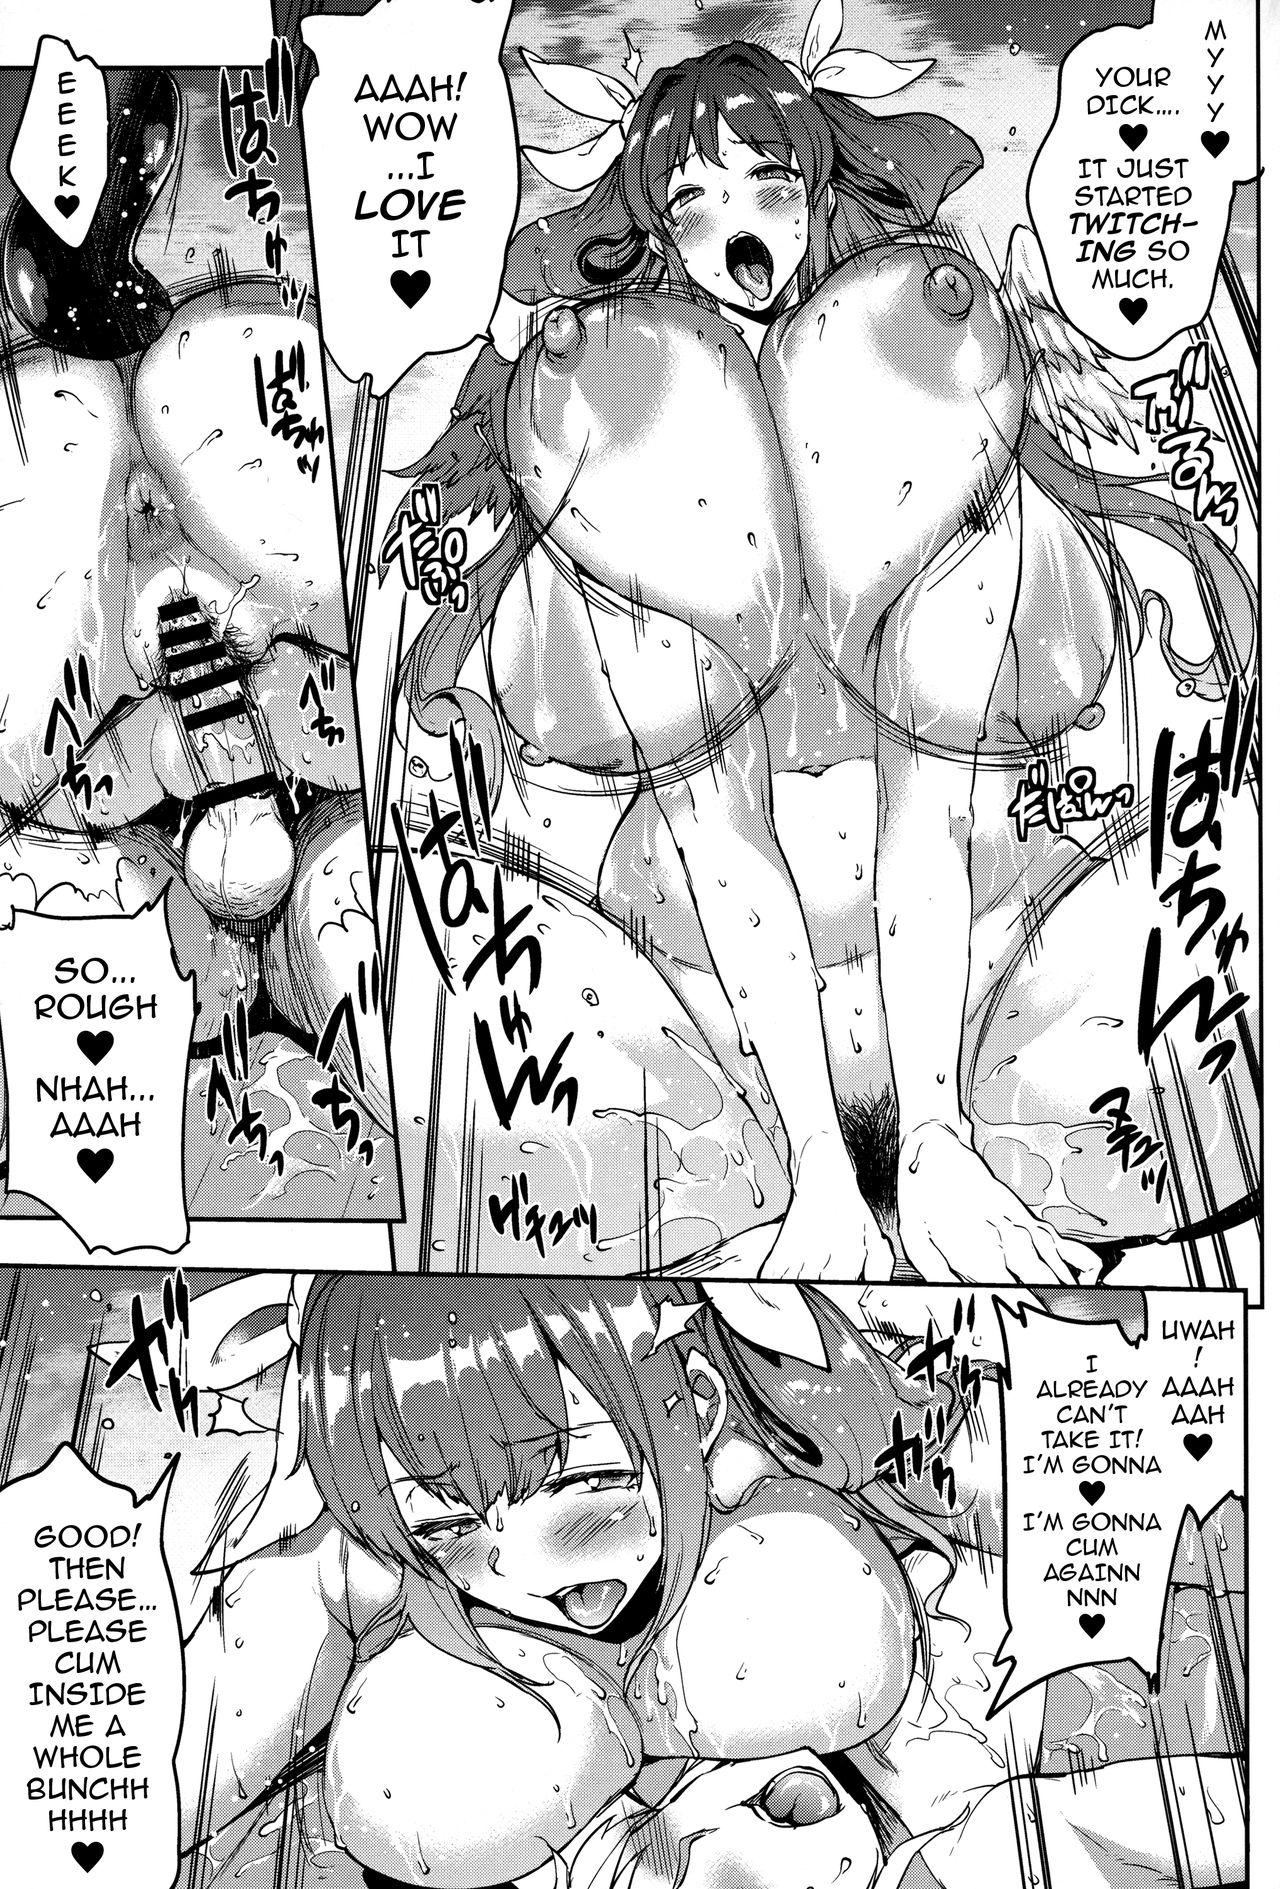 (C91) [ERECT TOUCH (Erect Sawaru)] Osanazuma Bakunyuu Nurunuru Soap-jou | Big-Breasted Soapy Massage Giving Young Wife (Guilty Gear)  [English] {darknight} 19